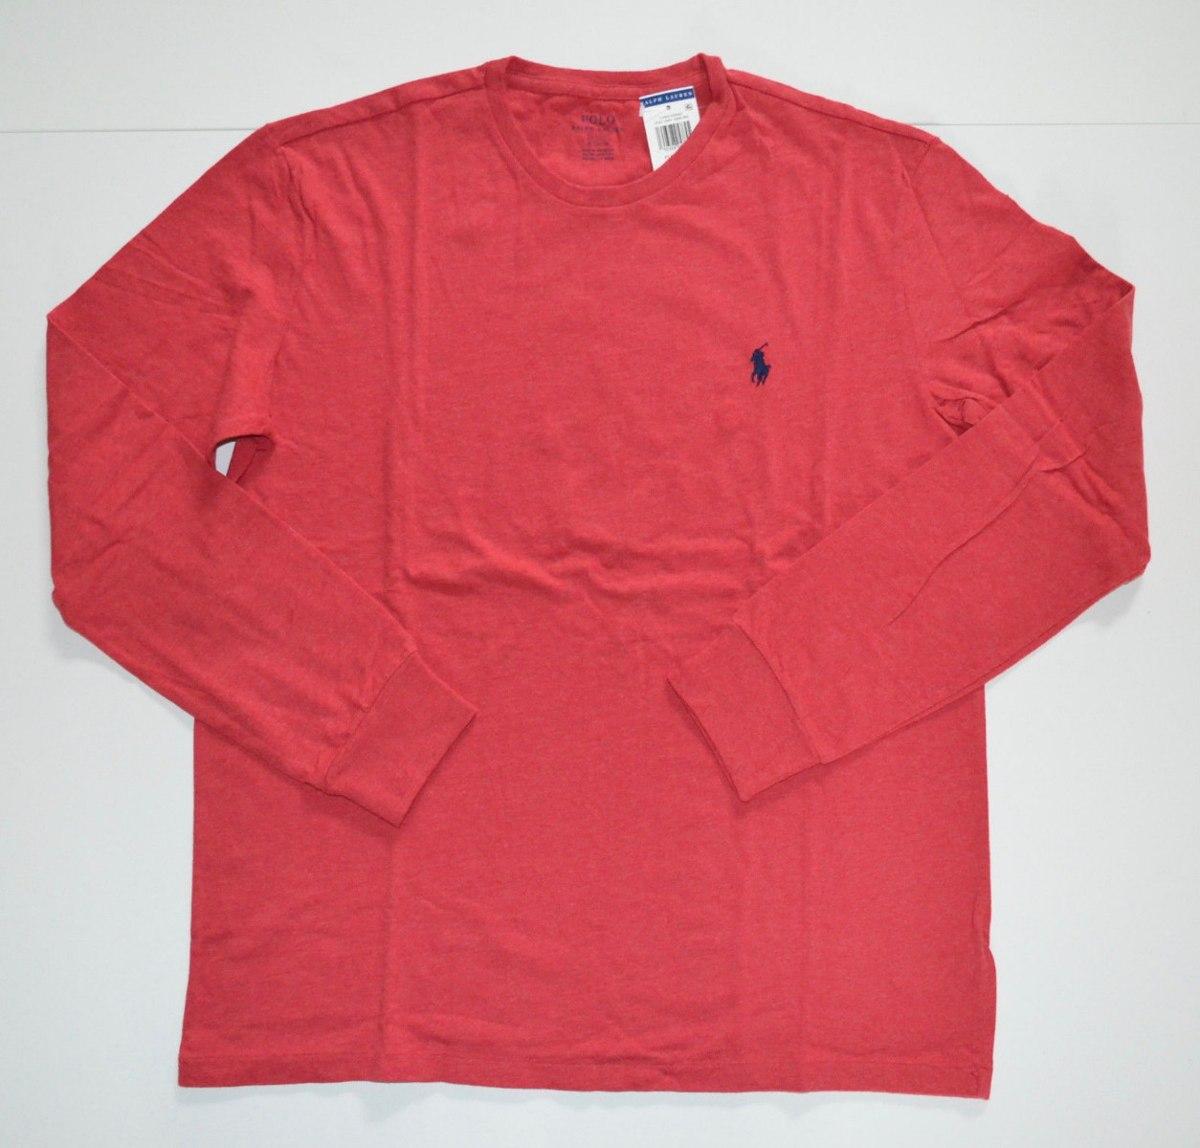 camiseta básica polo ralph lauren ggg xxl manga comprida. Carregando zoom. 4e58bb81aed